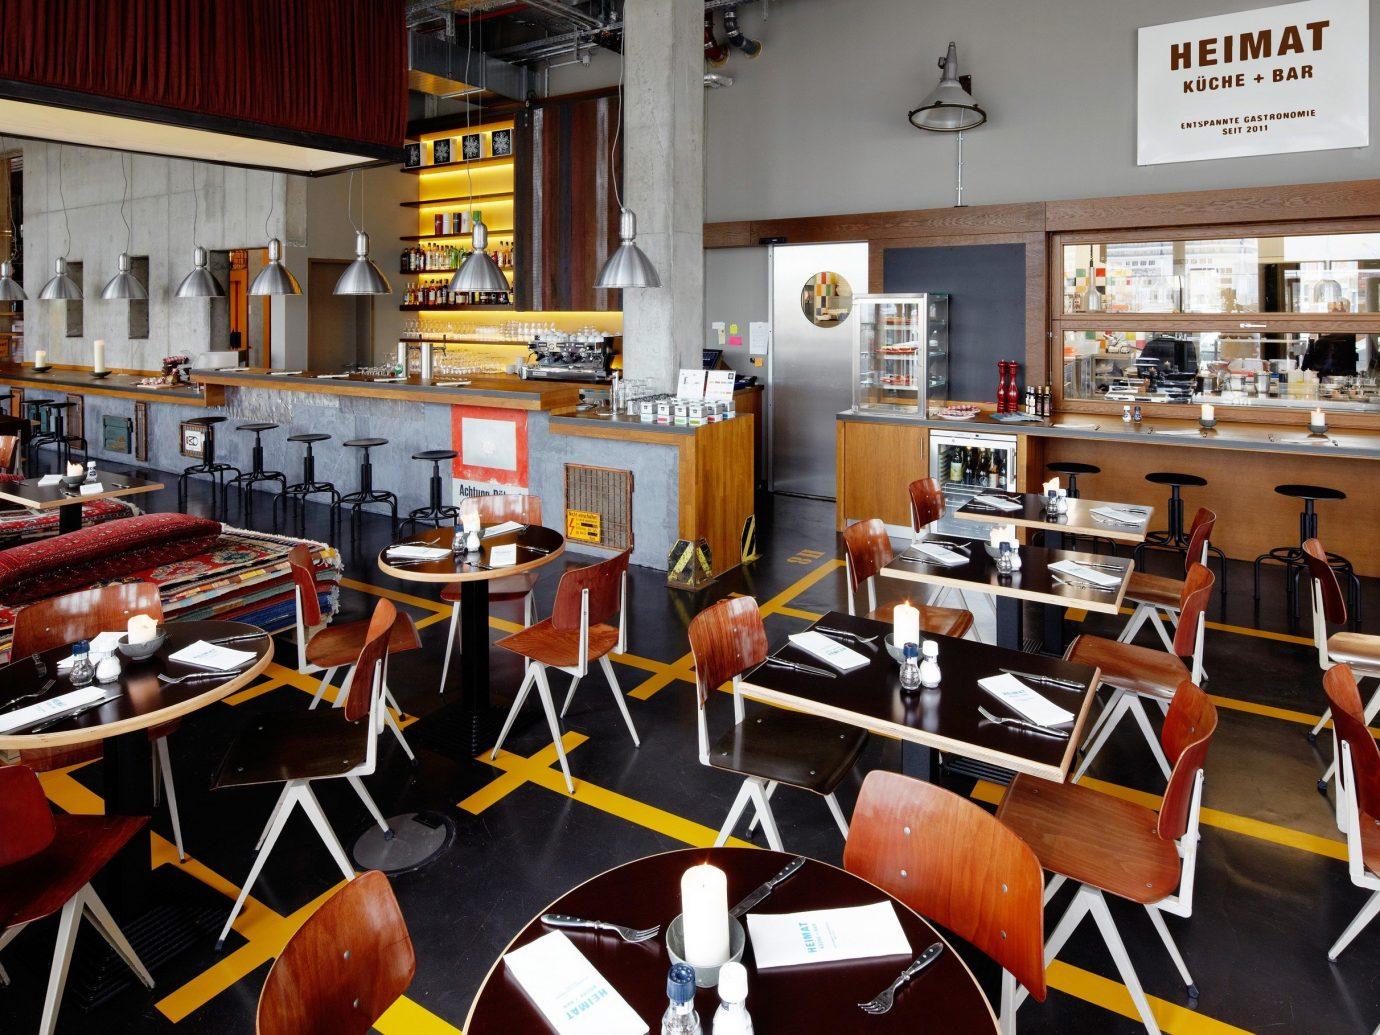 Food + Drink indoor table floor chair Kitchen room restaurant interior design Design Dining meal area furniture cluttered